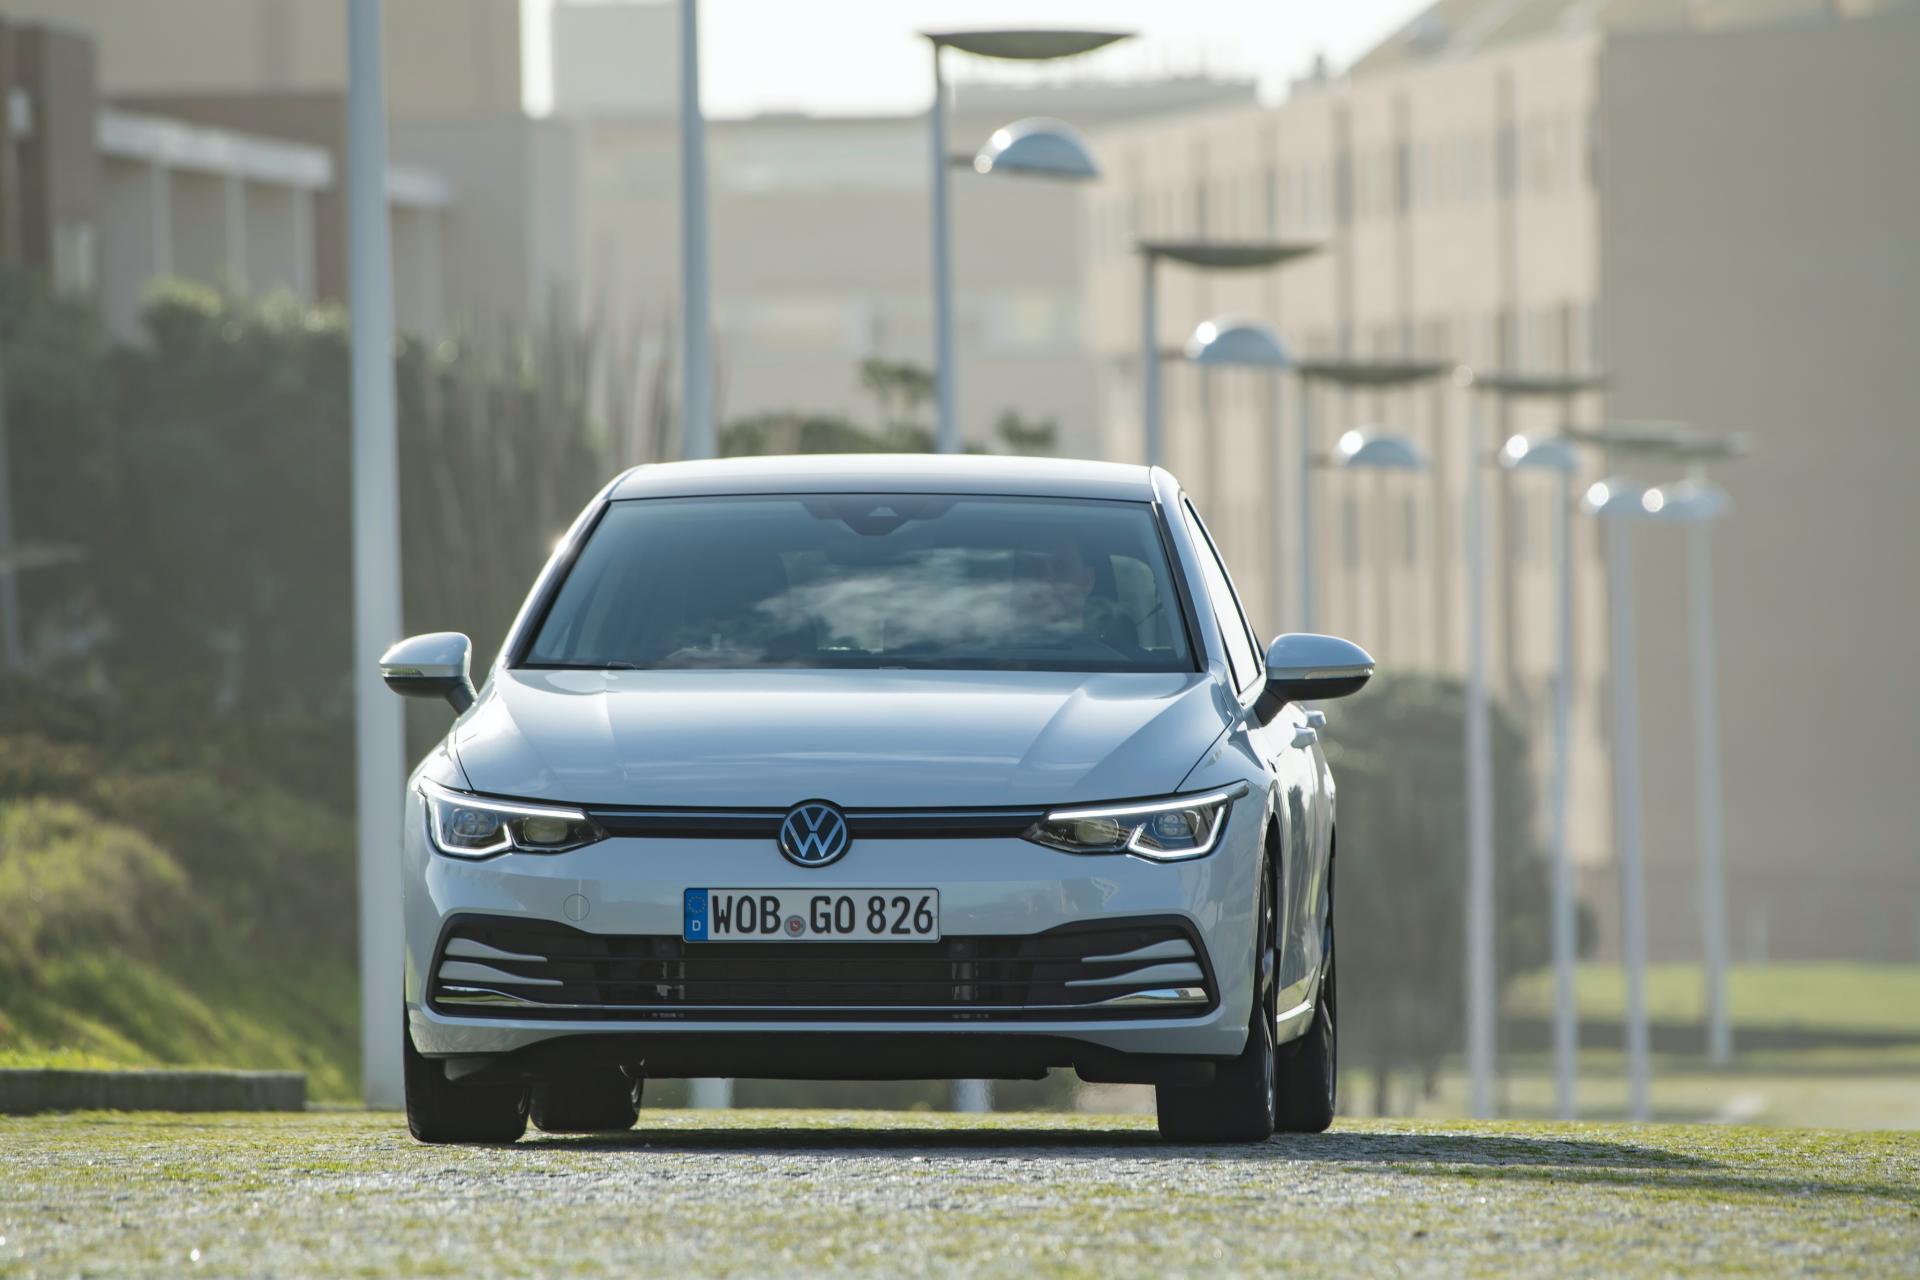 2020-VW-Golf-Mk8-104